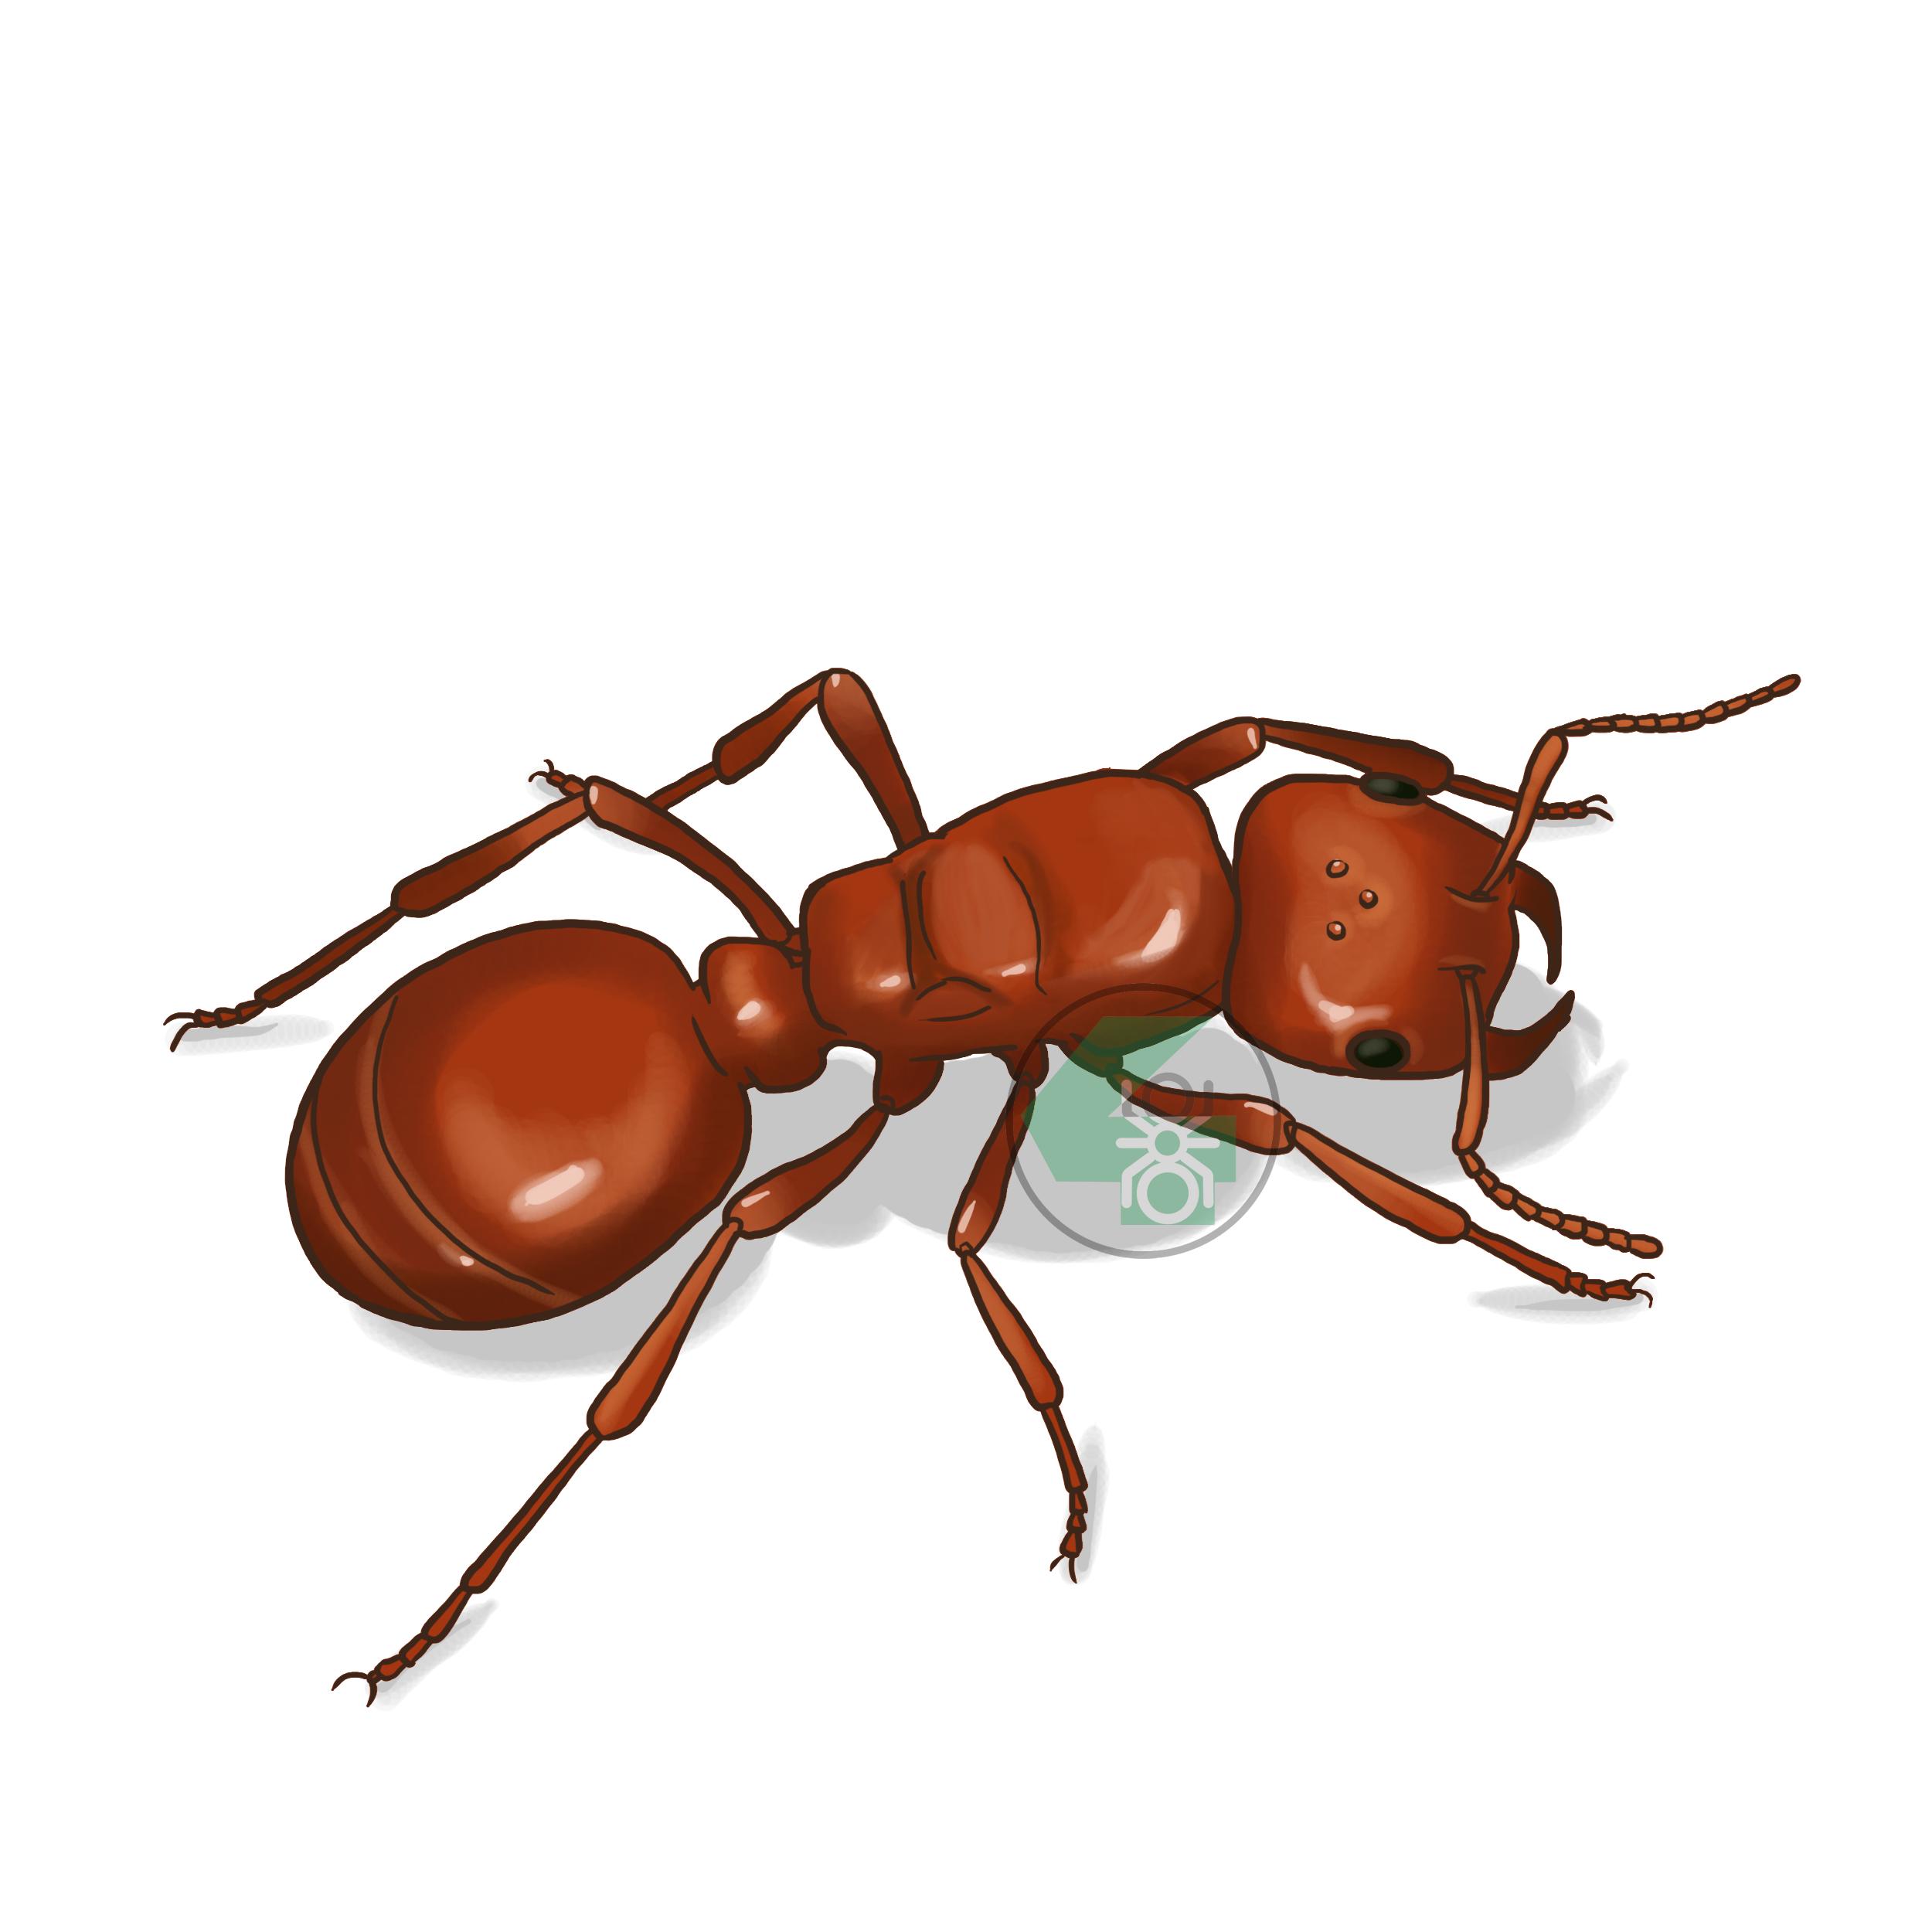 Polyergus rufescens (муравей-амазонка)